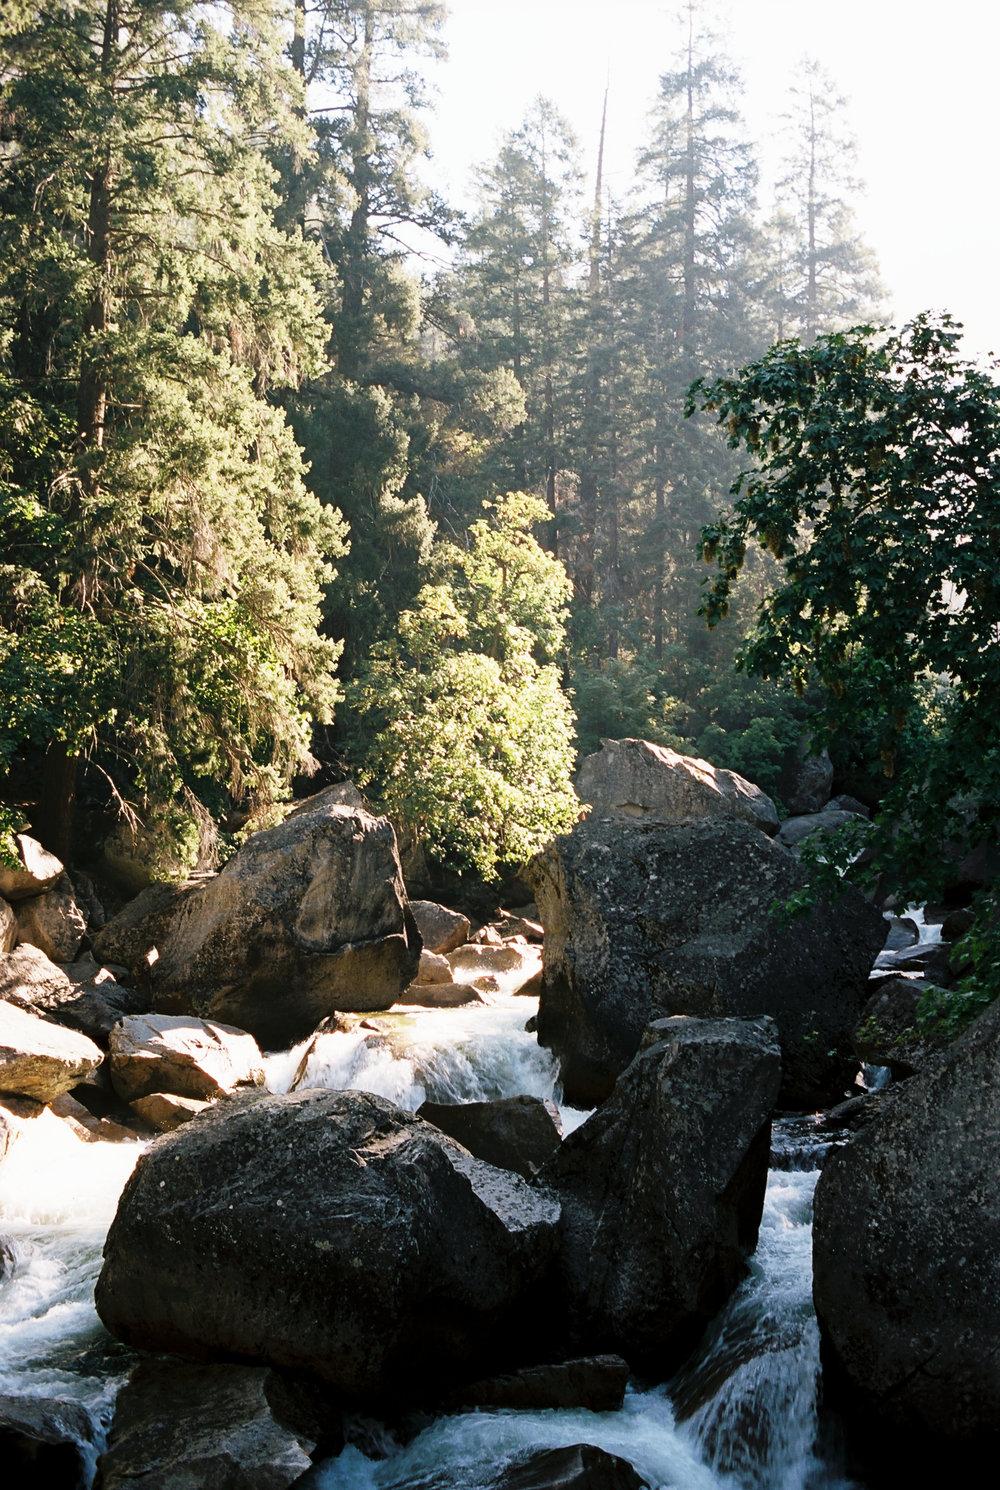 2017_susanadler_Yosemite3068.jpg